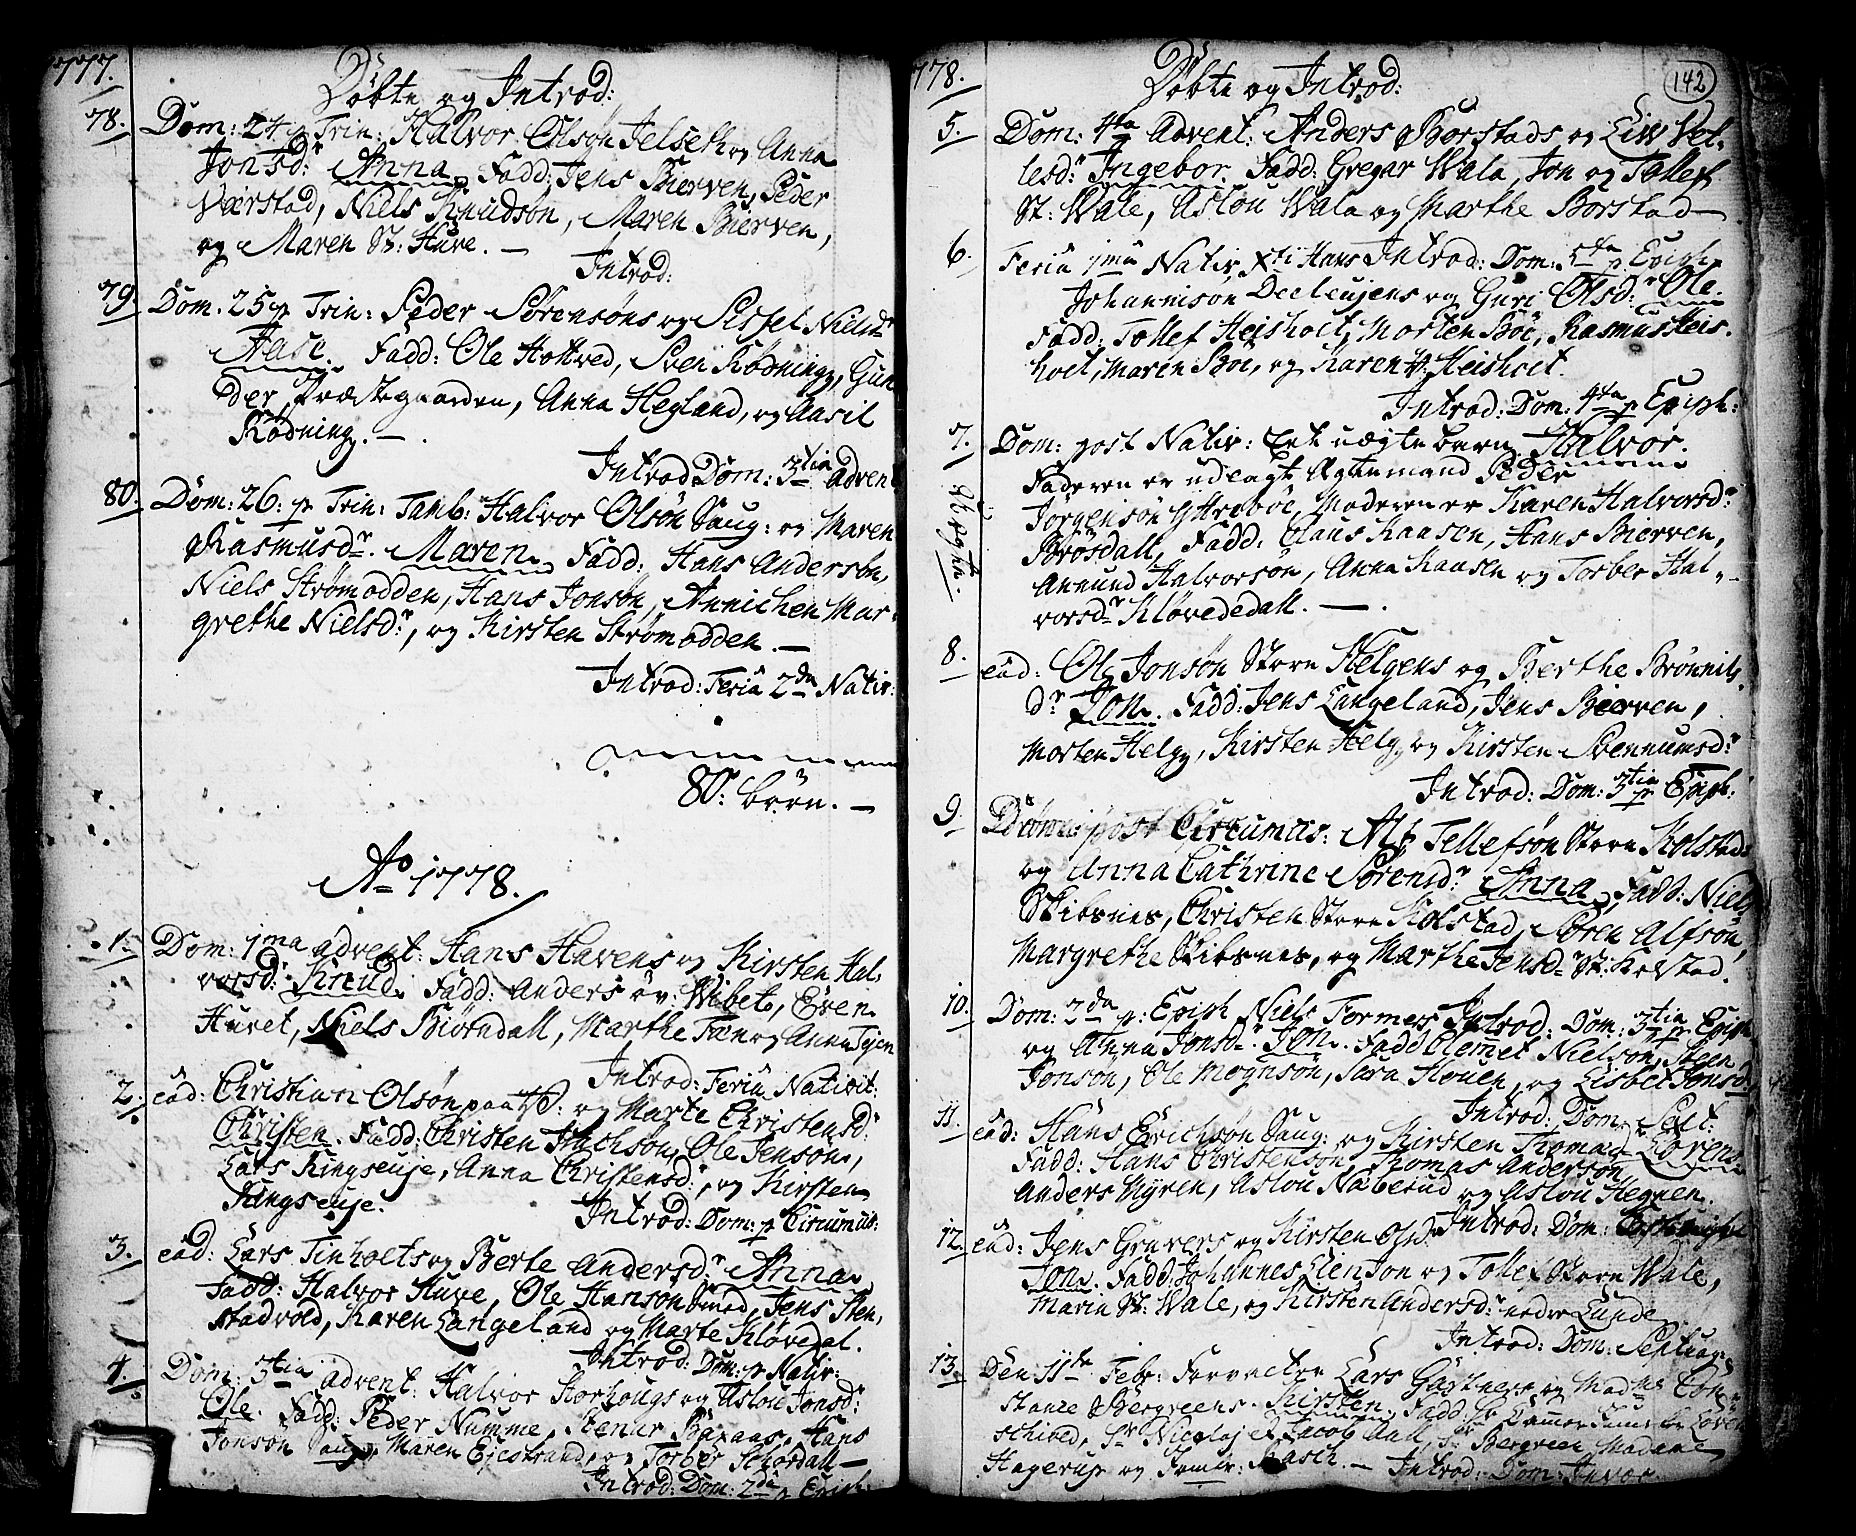 SAKO, Holla kirkebøker, F/Fa/L0001: Ministerialbok nr. 1, 1717-1779, s. 142